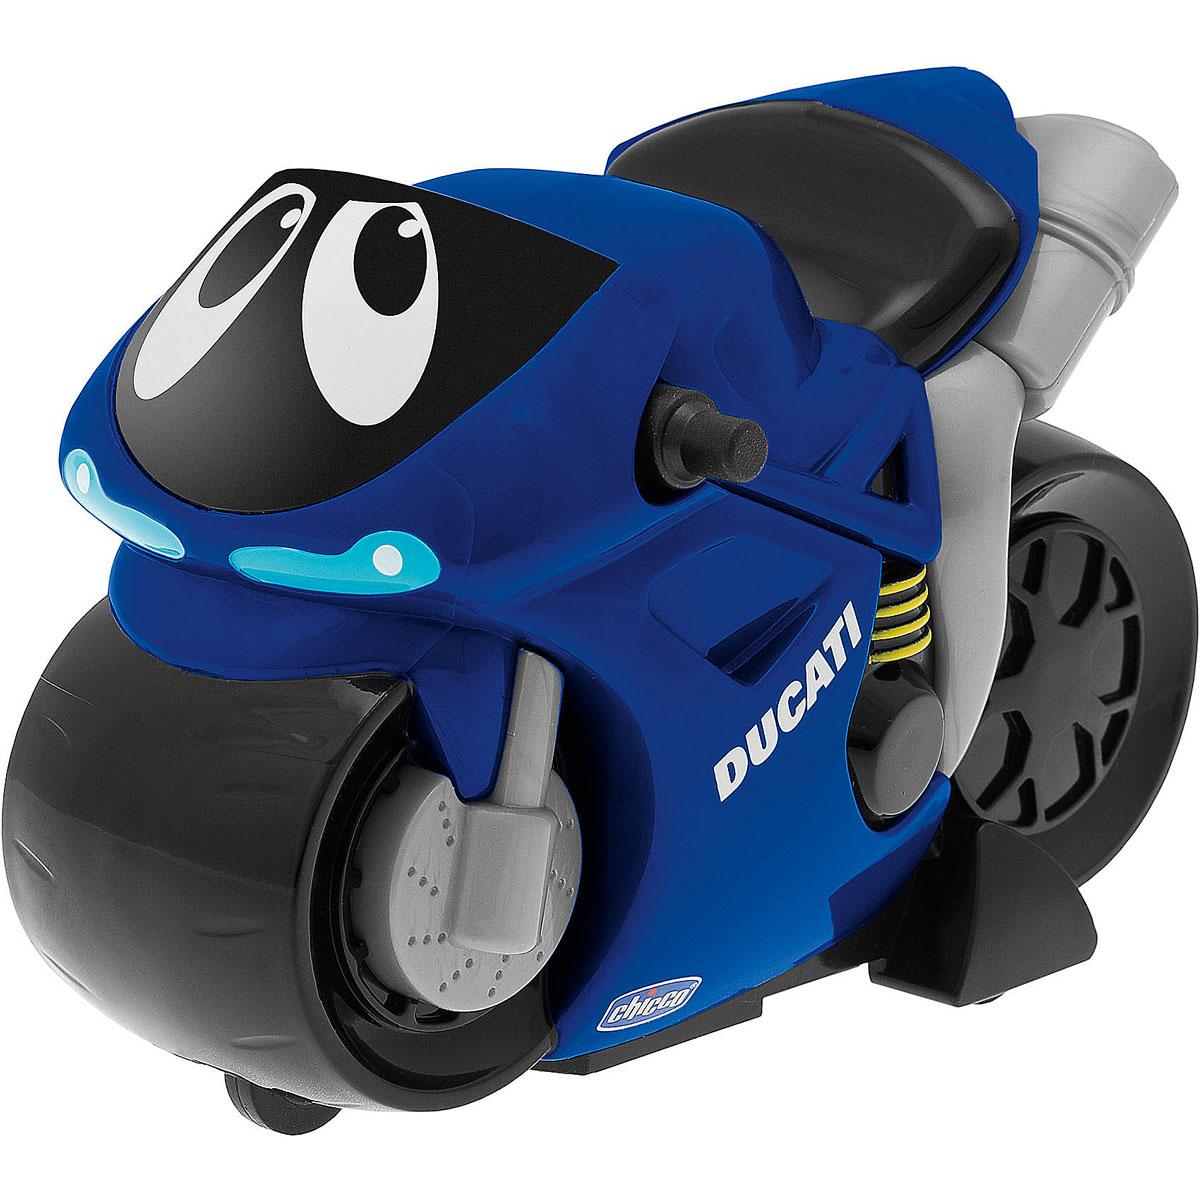 Chicco Мотоцикл Turbo Touch Ducati цвет синий